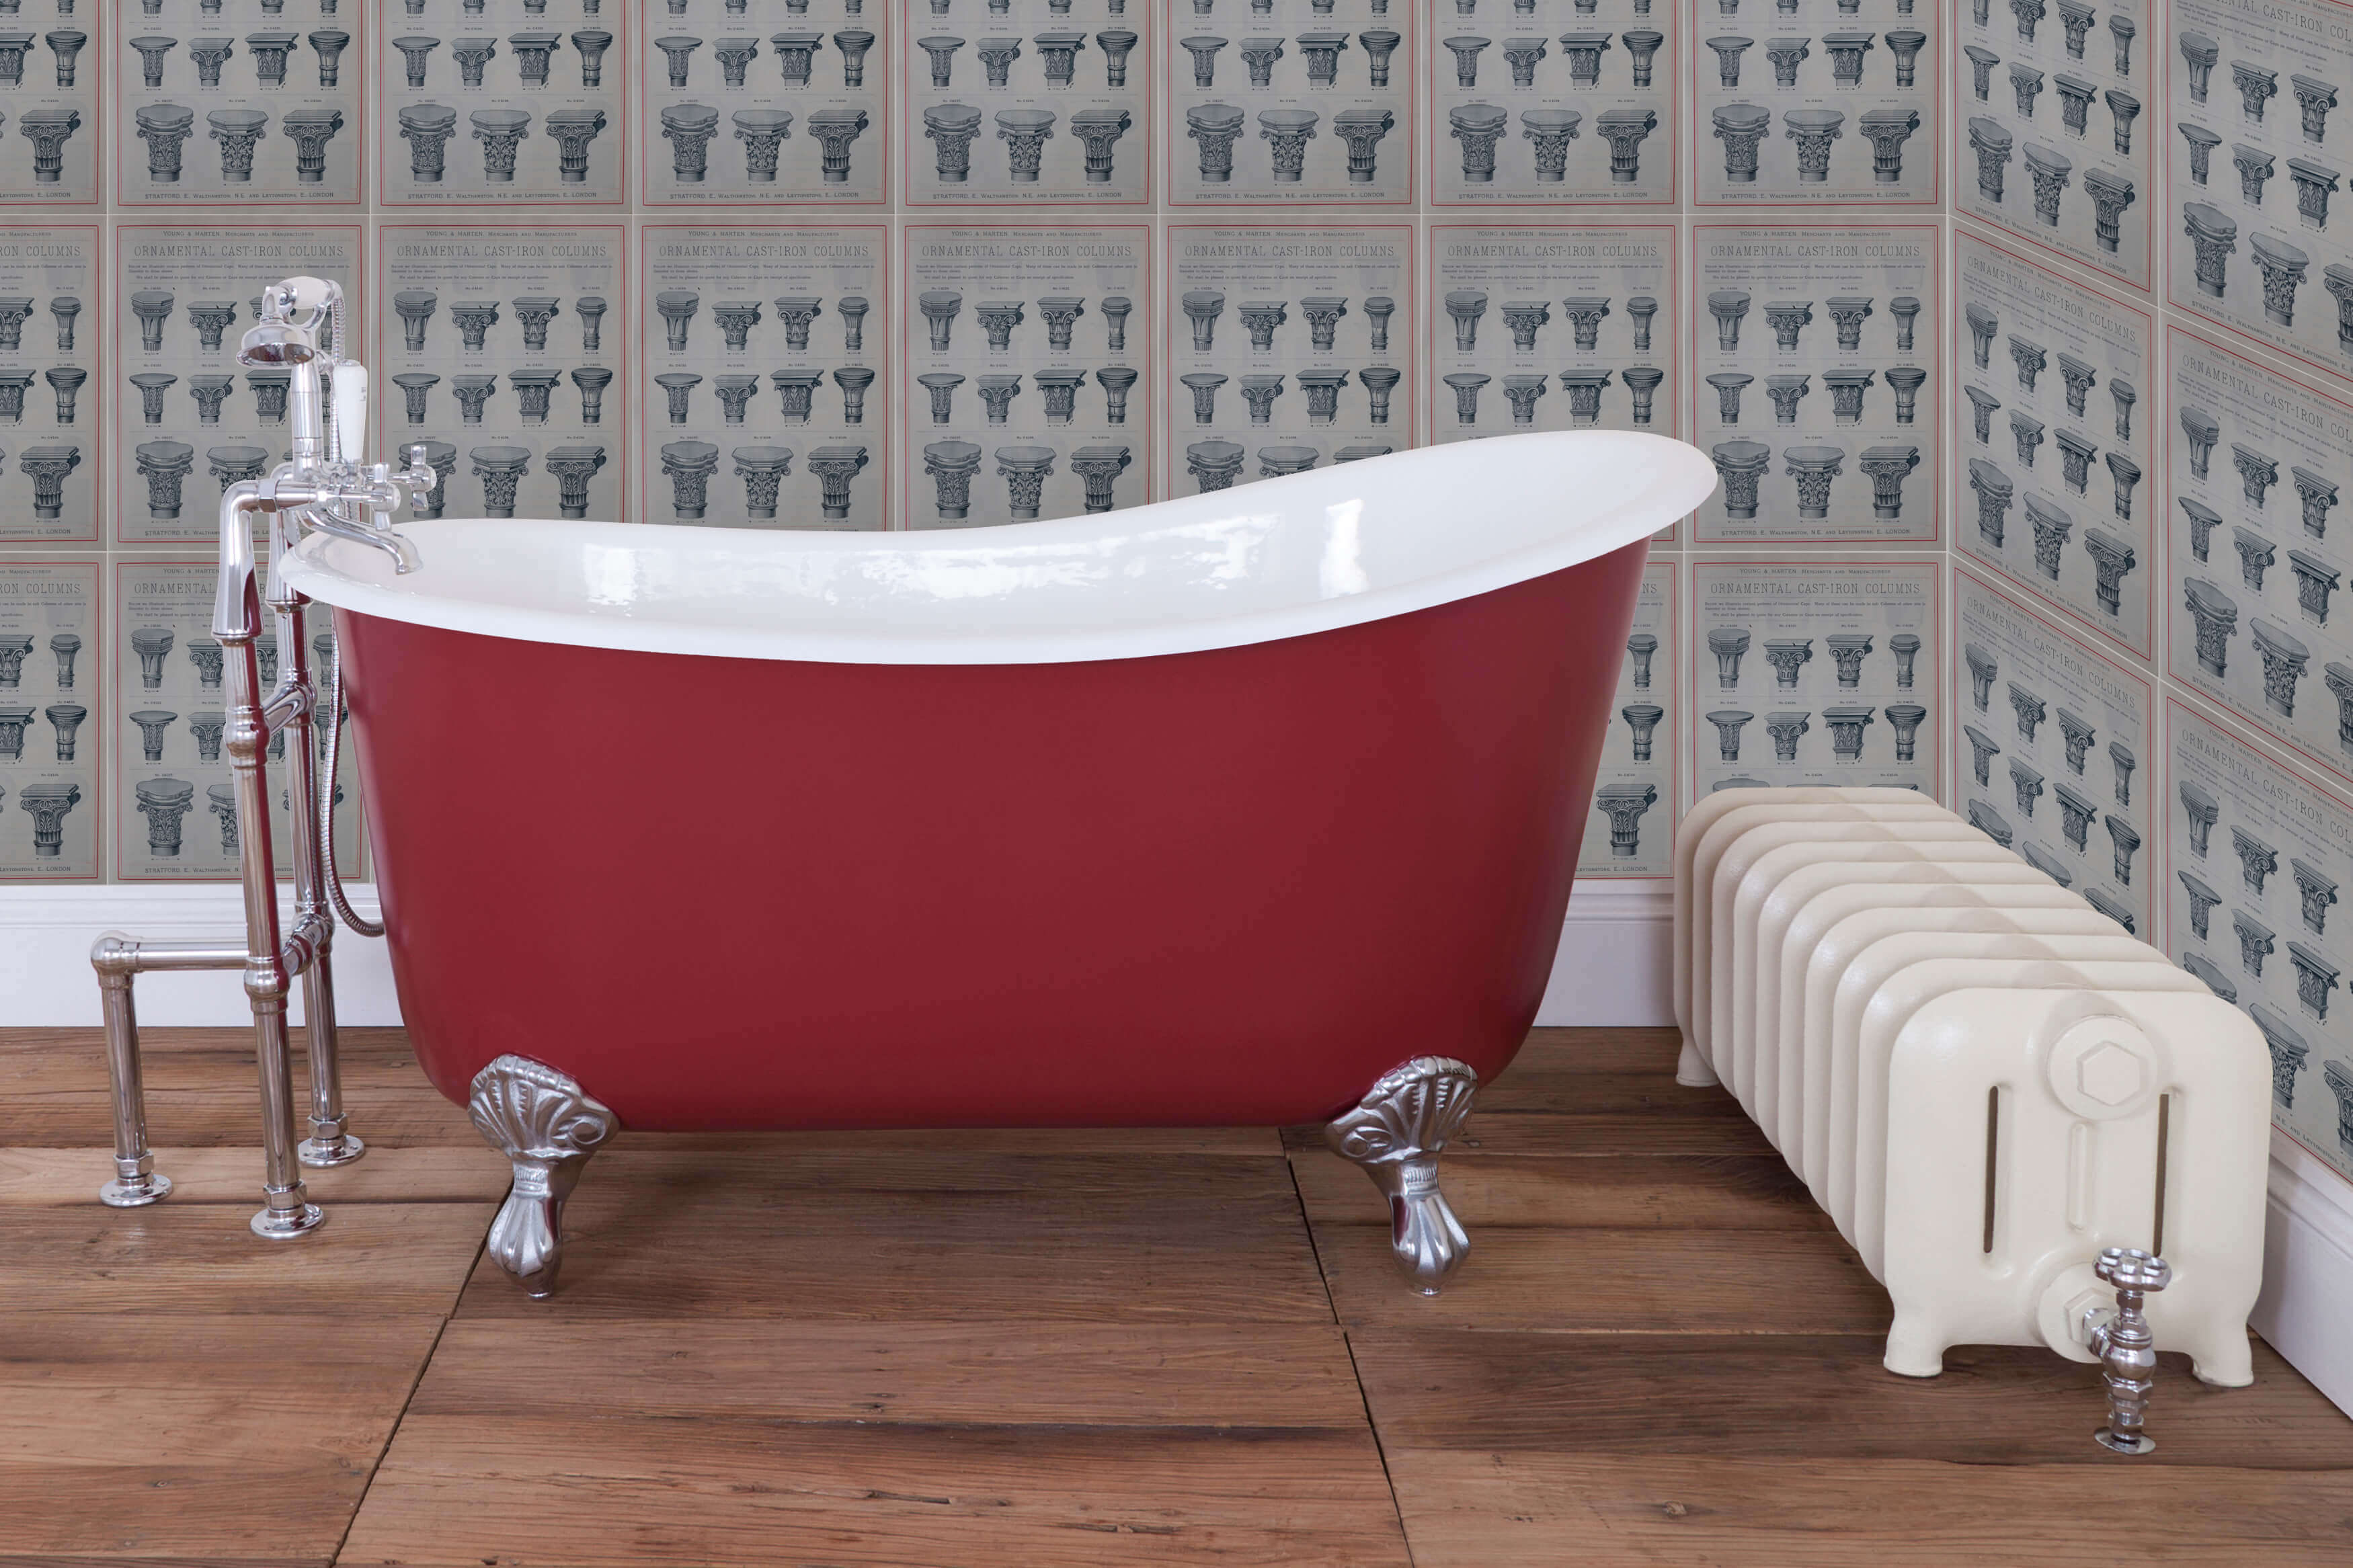 Lyon\' Single Slipper Cast Iron Bath - Warwick Reclamation